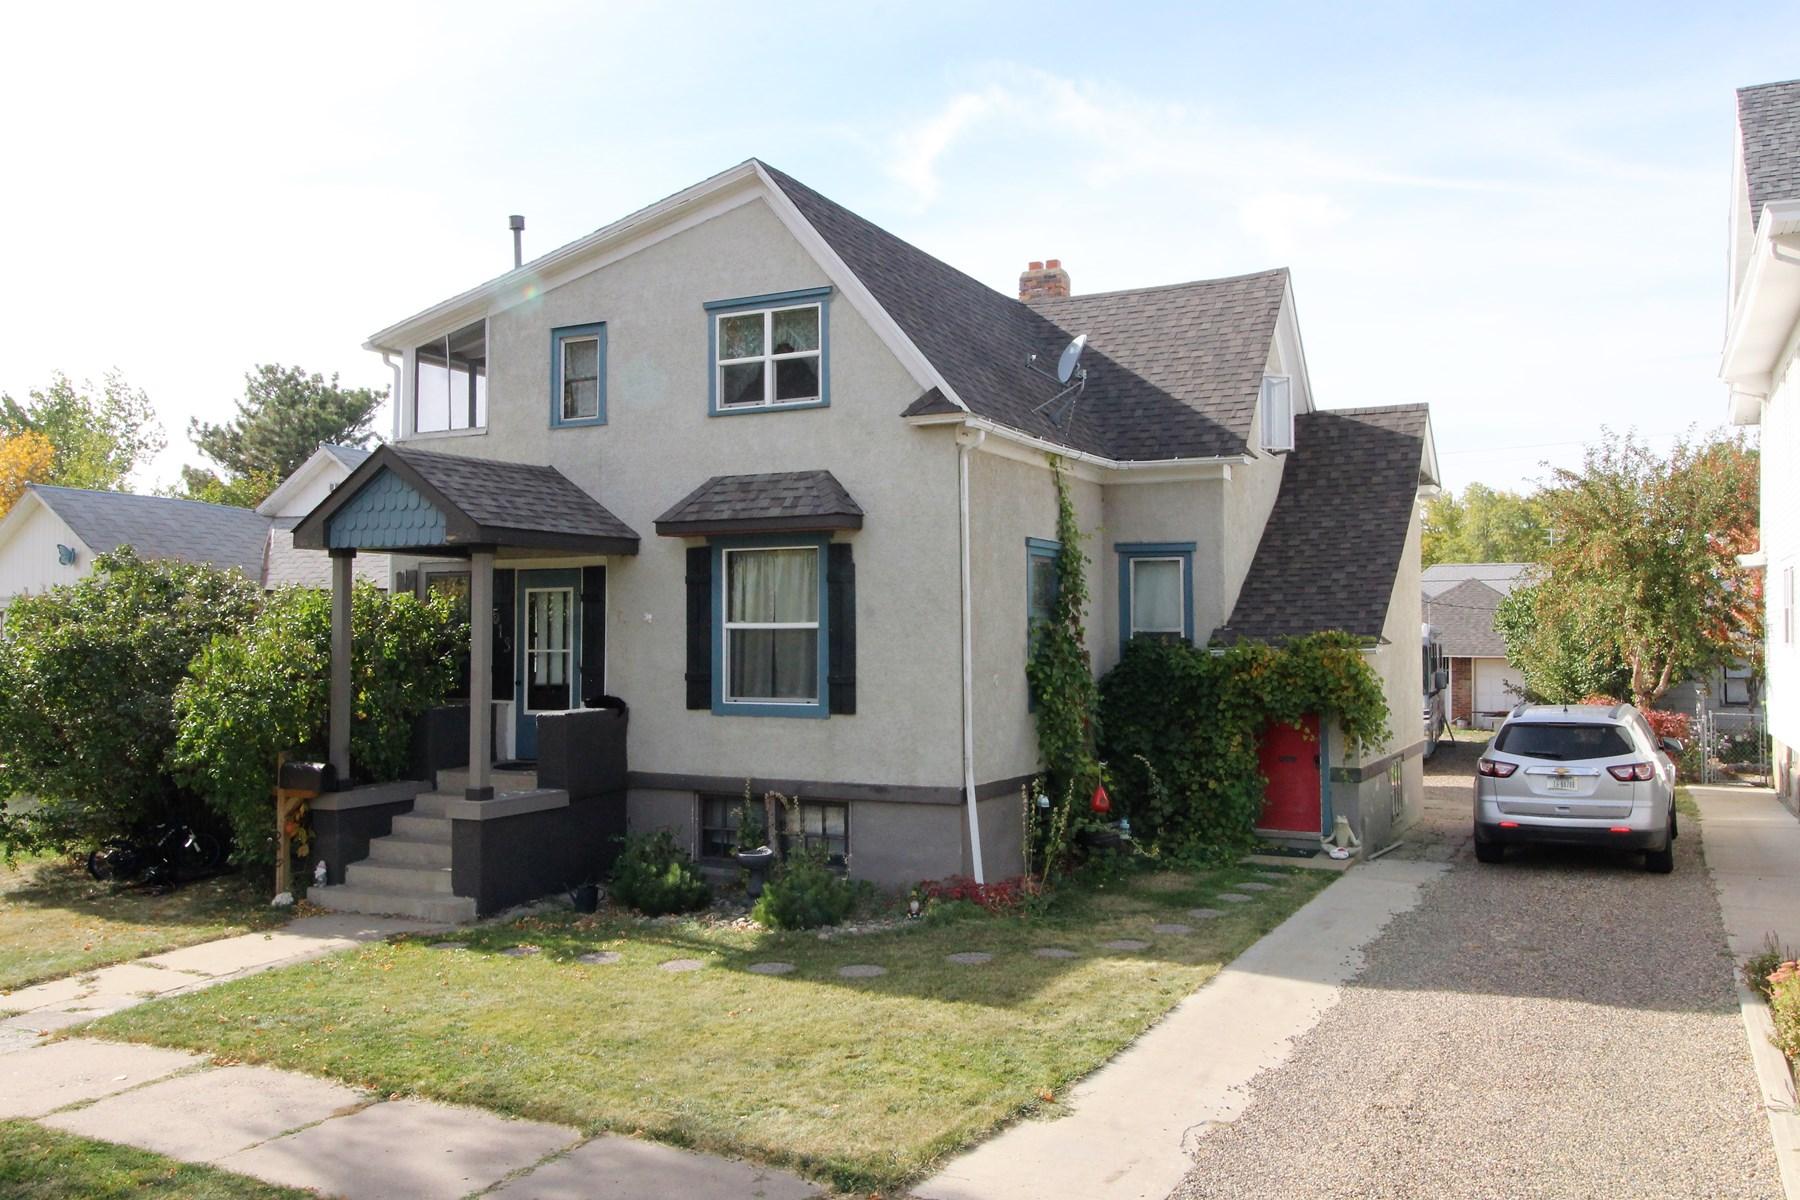 2 Story - 5 bedroom 3 bath home for sale in Glendive